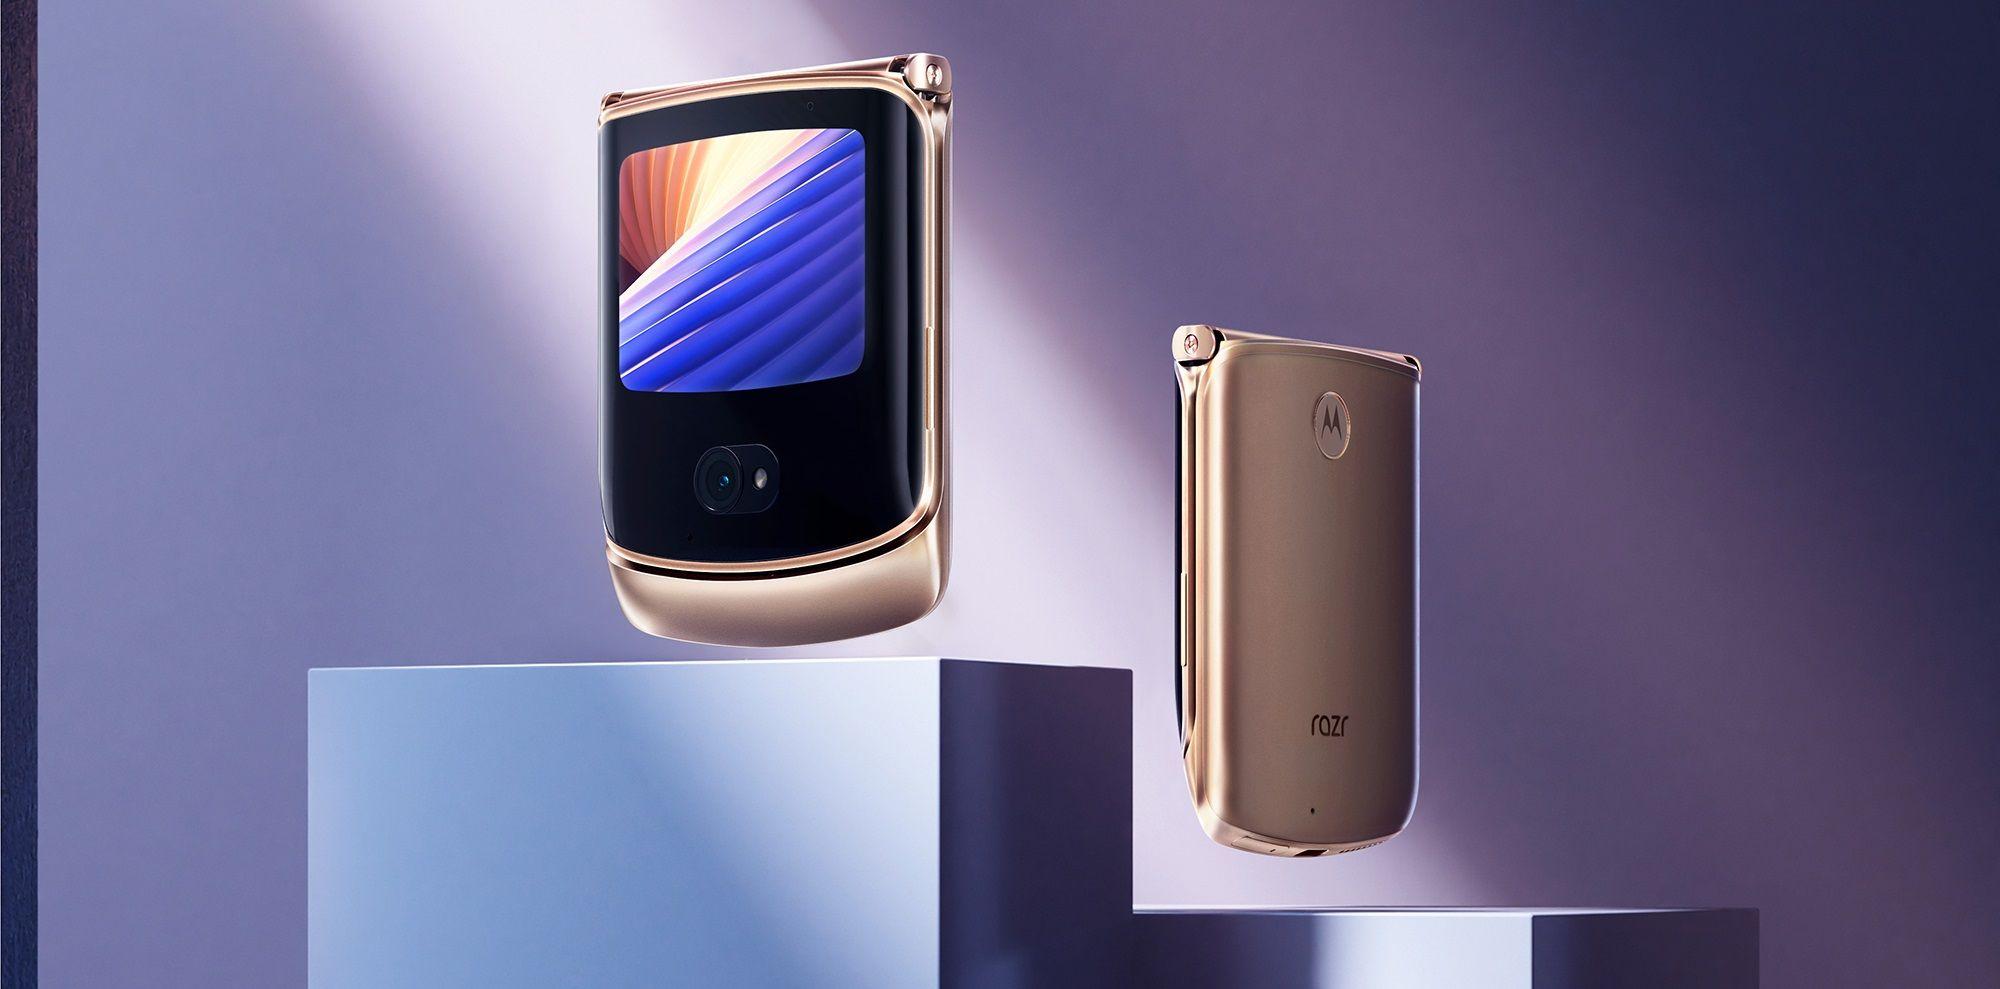 +Styleでmotorola razr 5Gを3月19日より予約開始、限定カラー「Blush Gold」を取り扱い